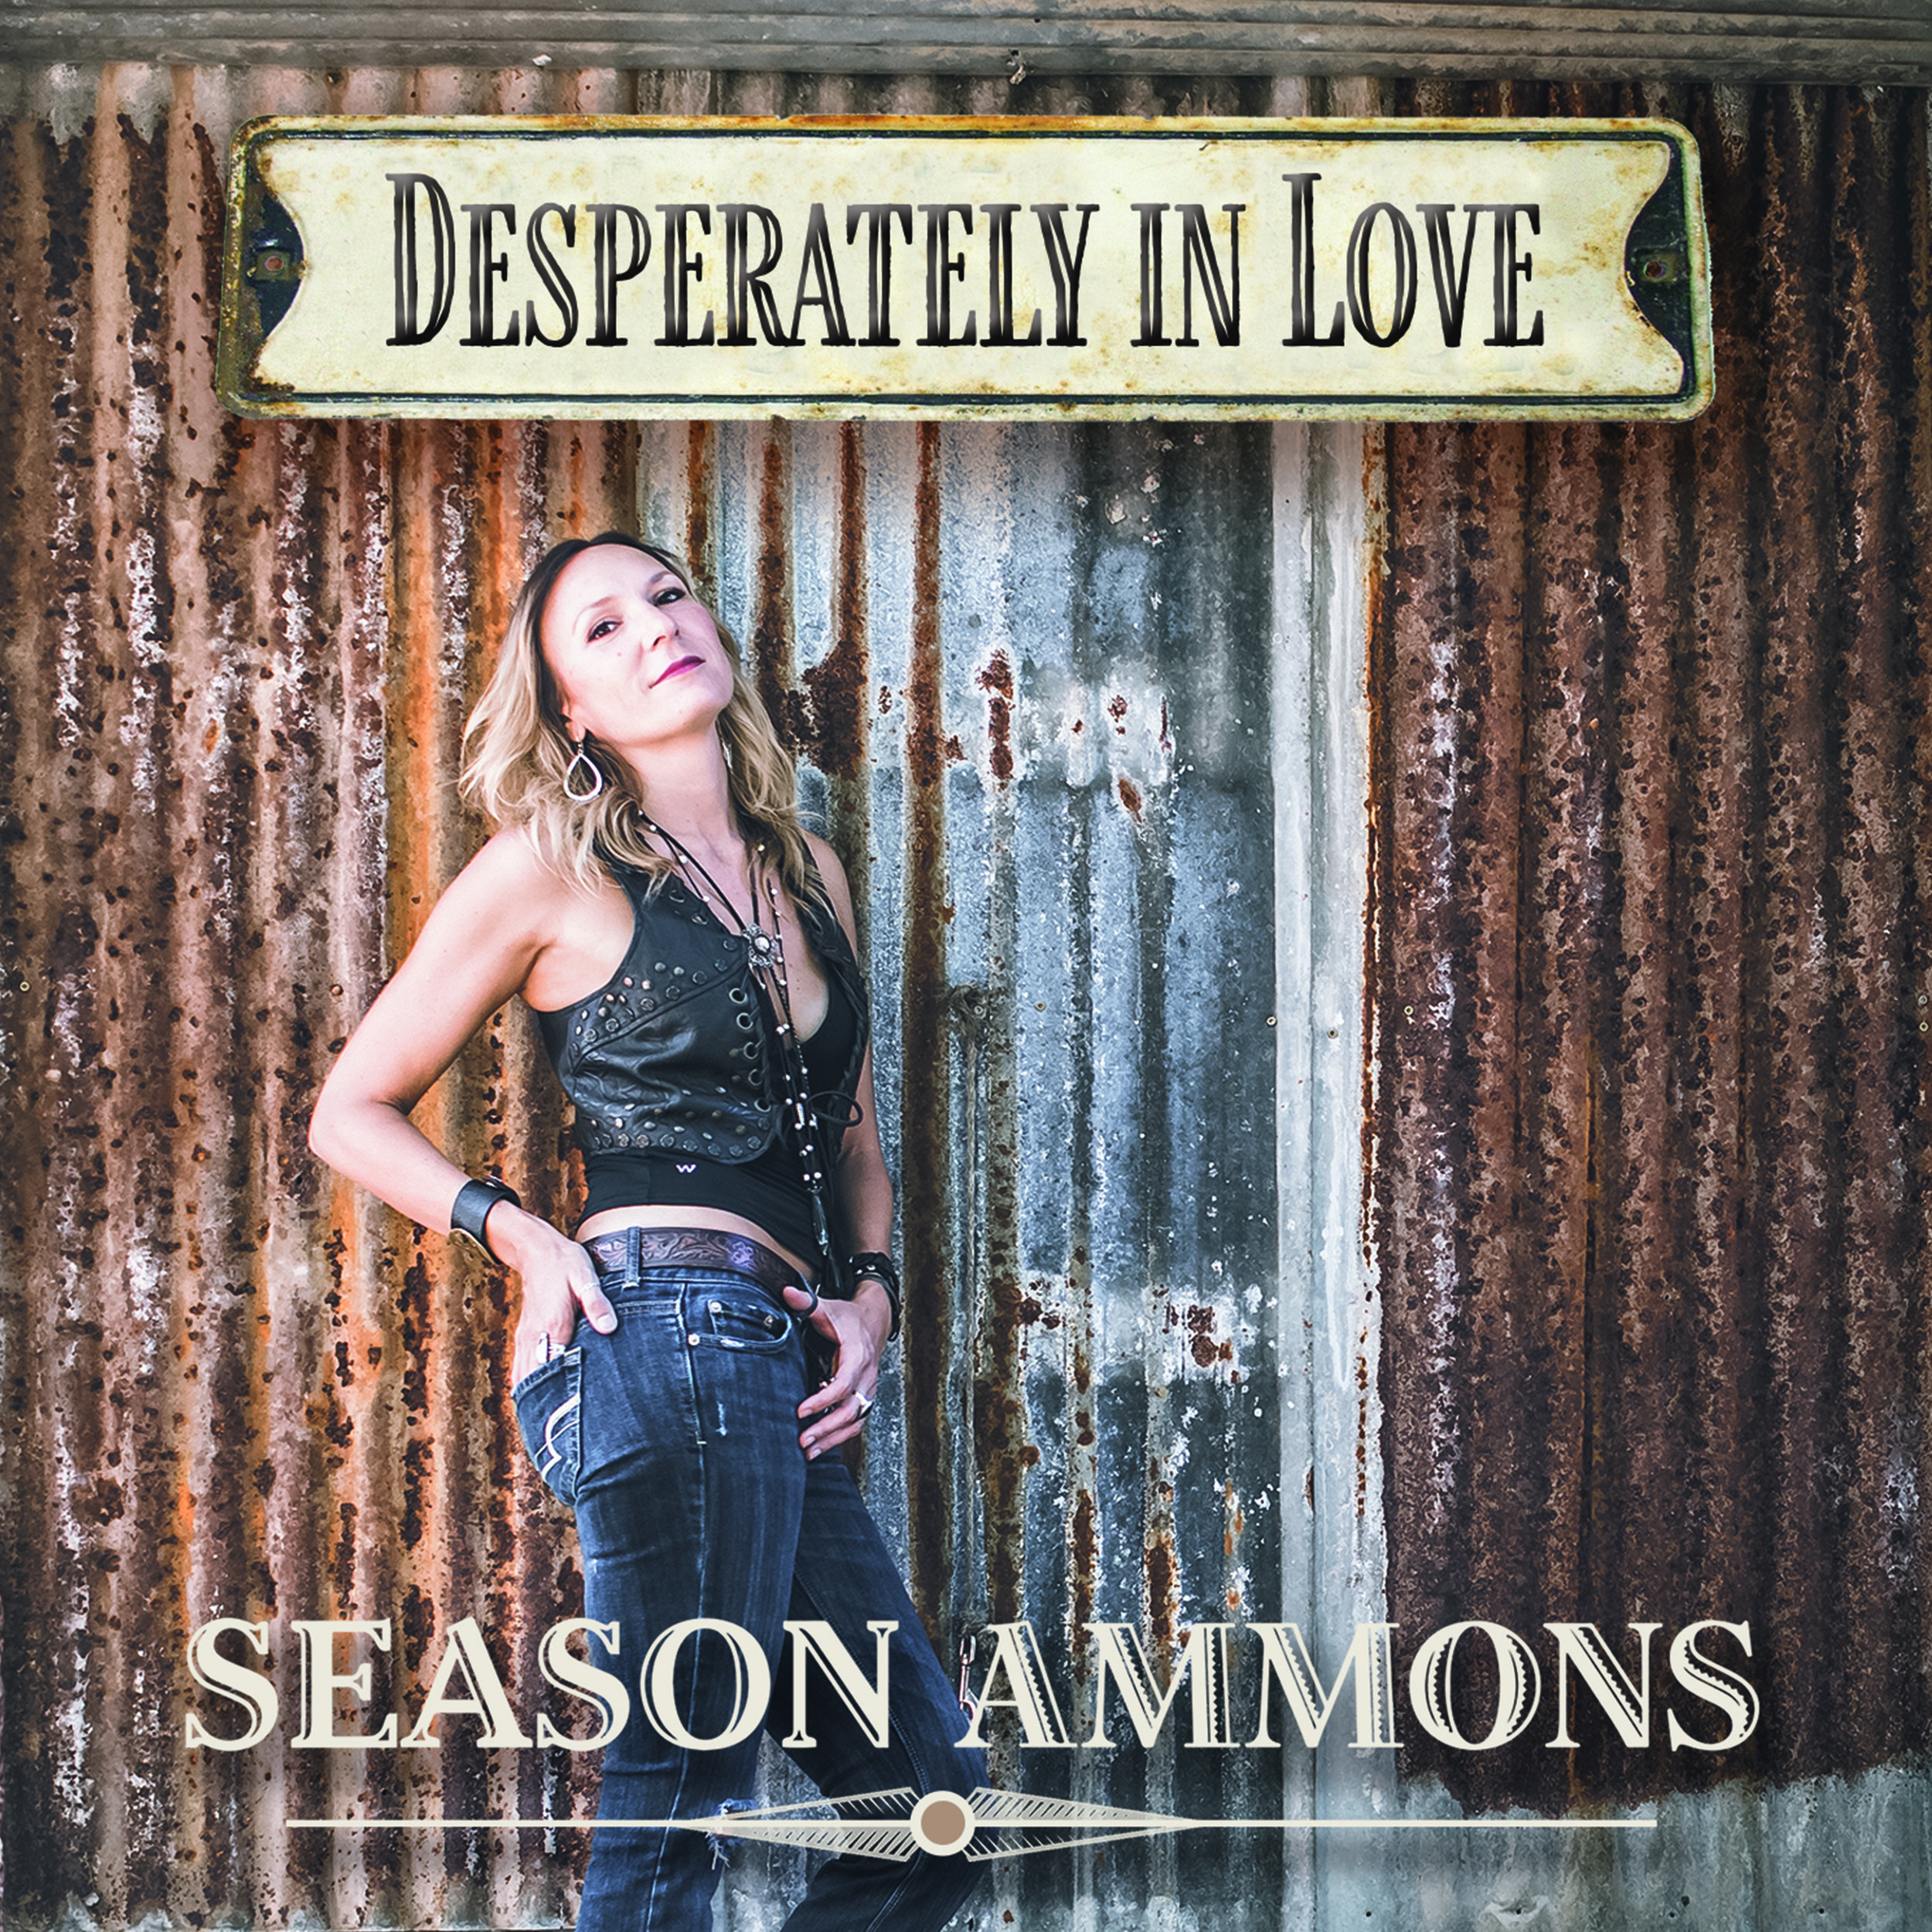 SEASON AMMONS - DESPERATELY IN LOVE - DIGITAL SQUARE SINGLE COVER.jpg